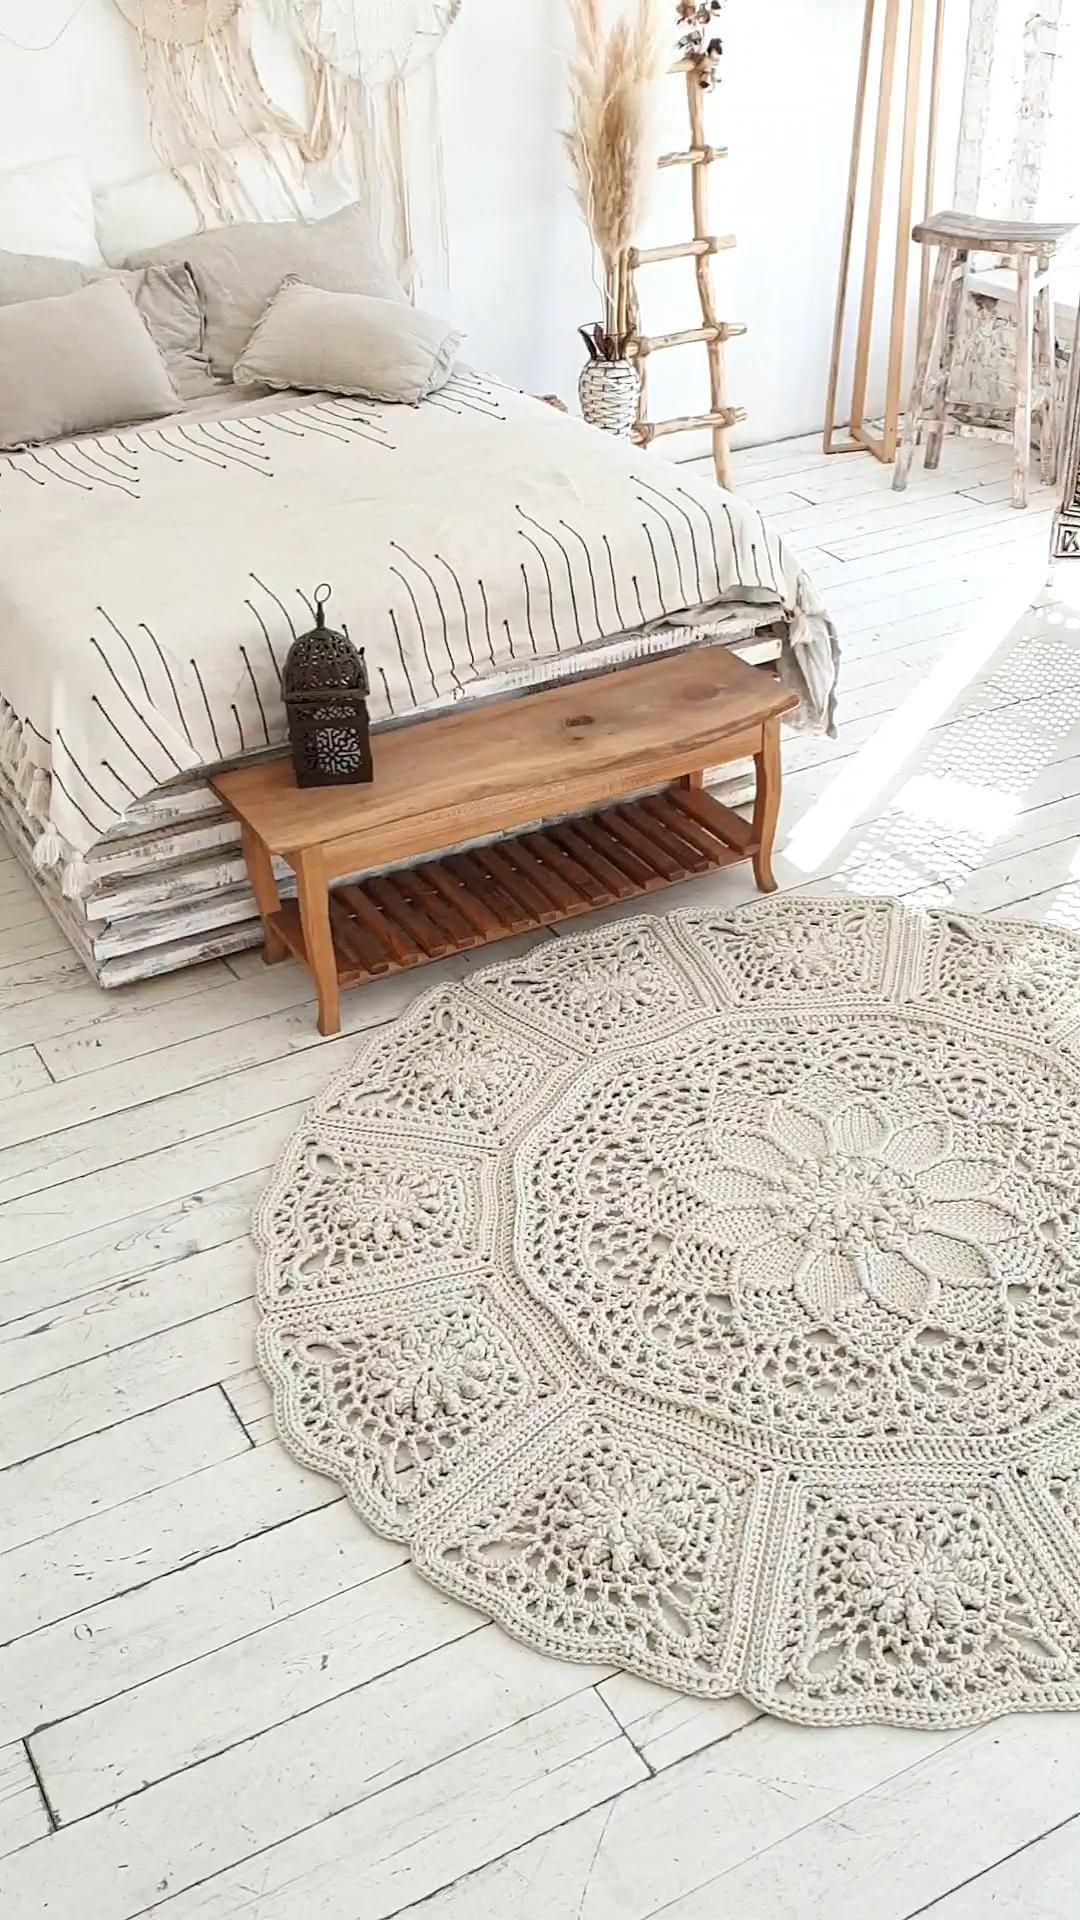 Crochet rug pattern (video